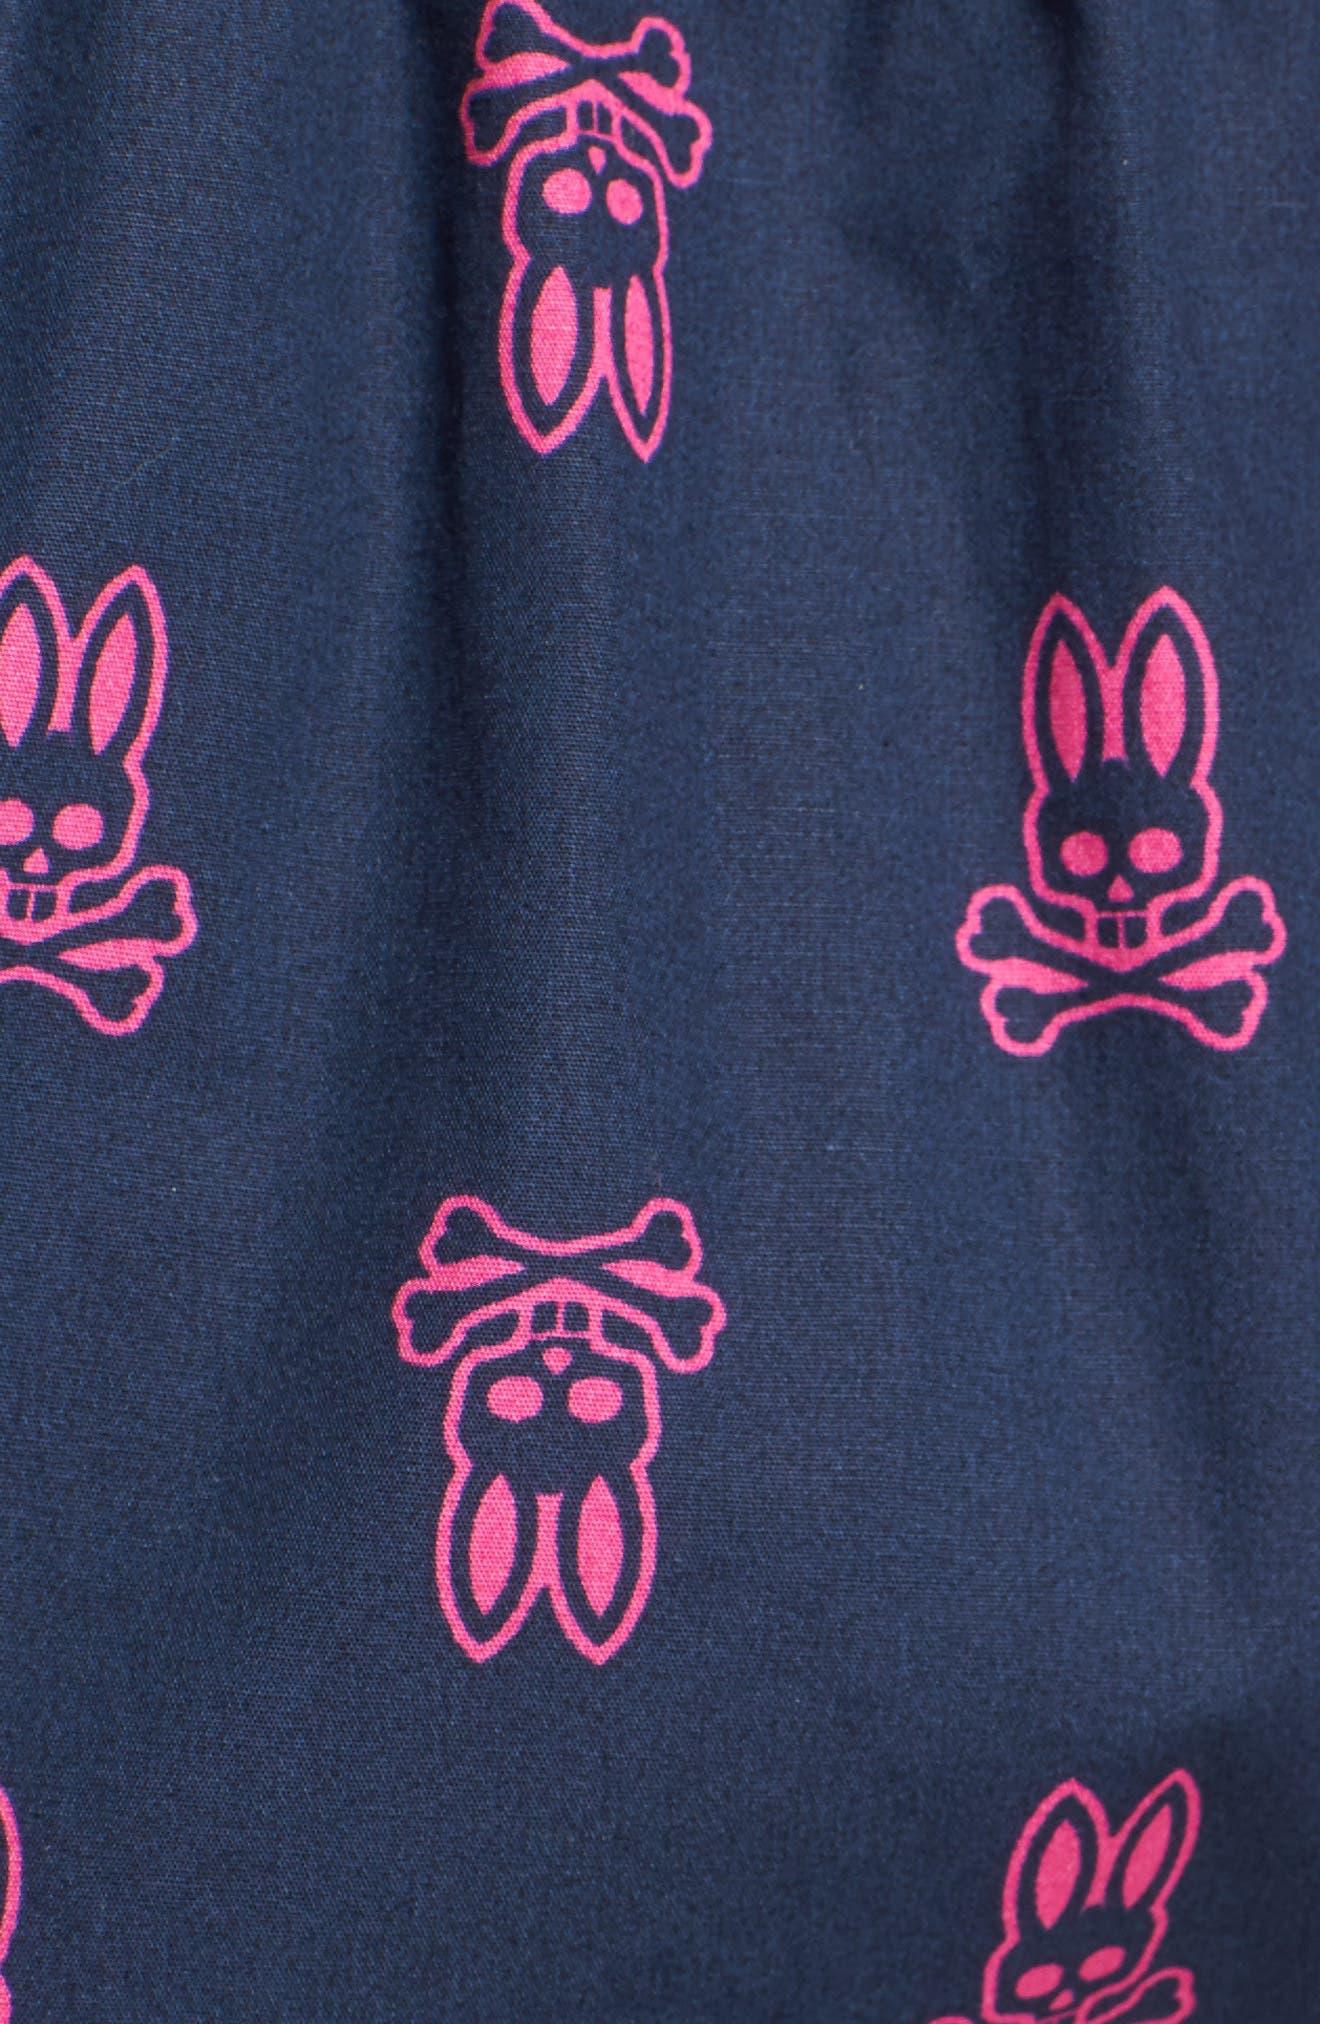 Cotton Lounge Shorts,                             Alternate thumbnail 5, color,                             Peacoat Bunny